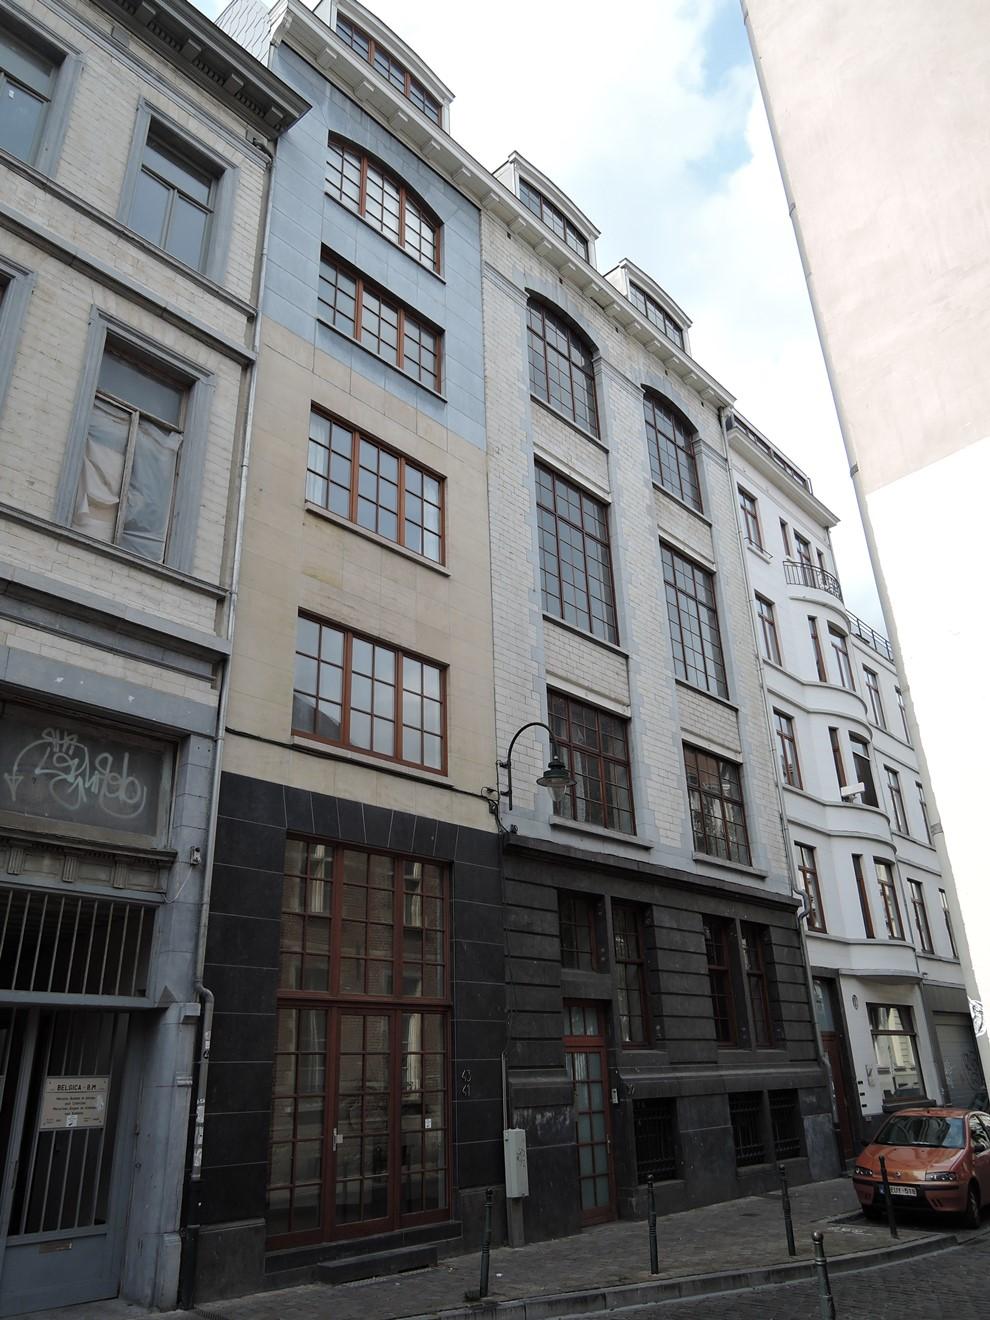 Rue Saint-Christophe 39-41-43, 2015